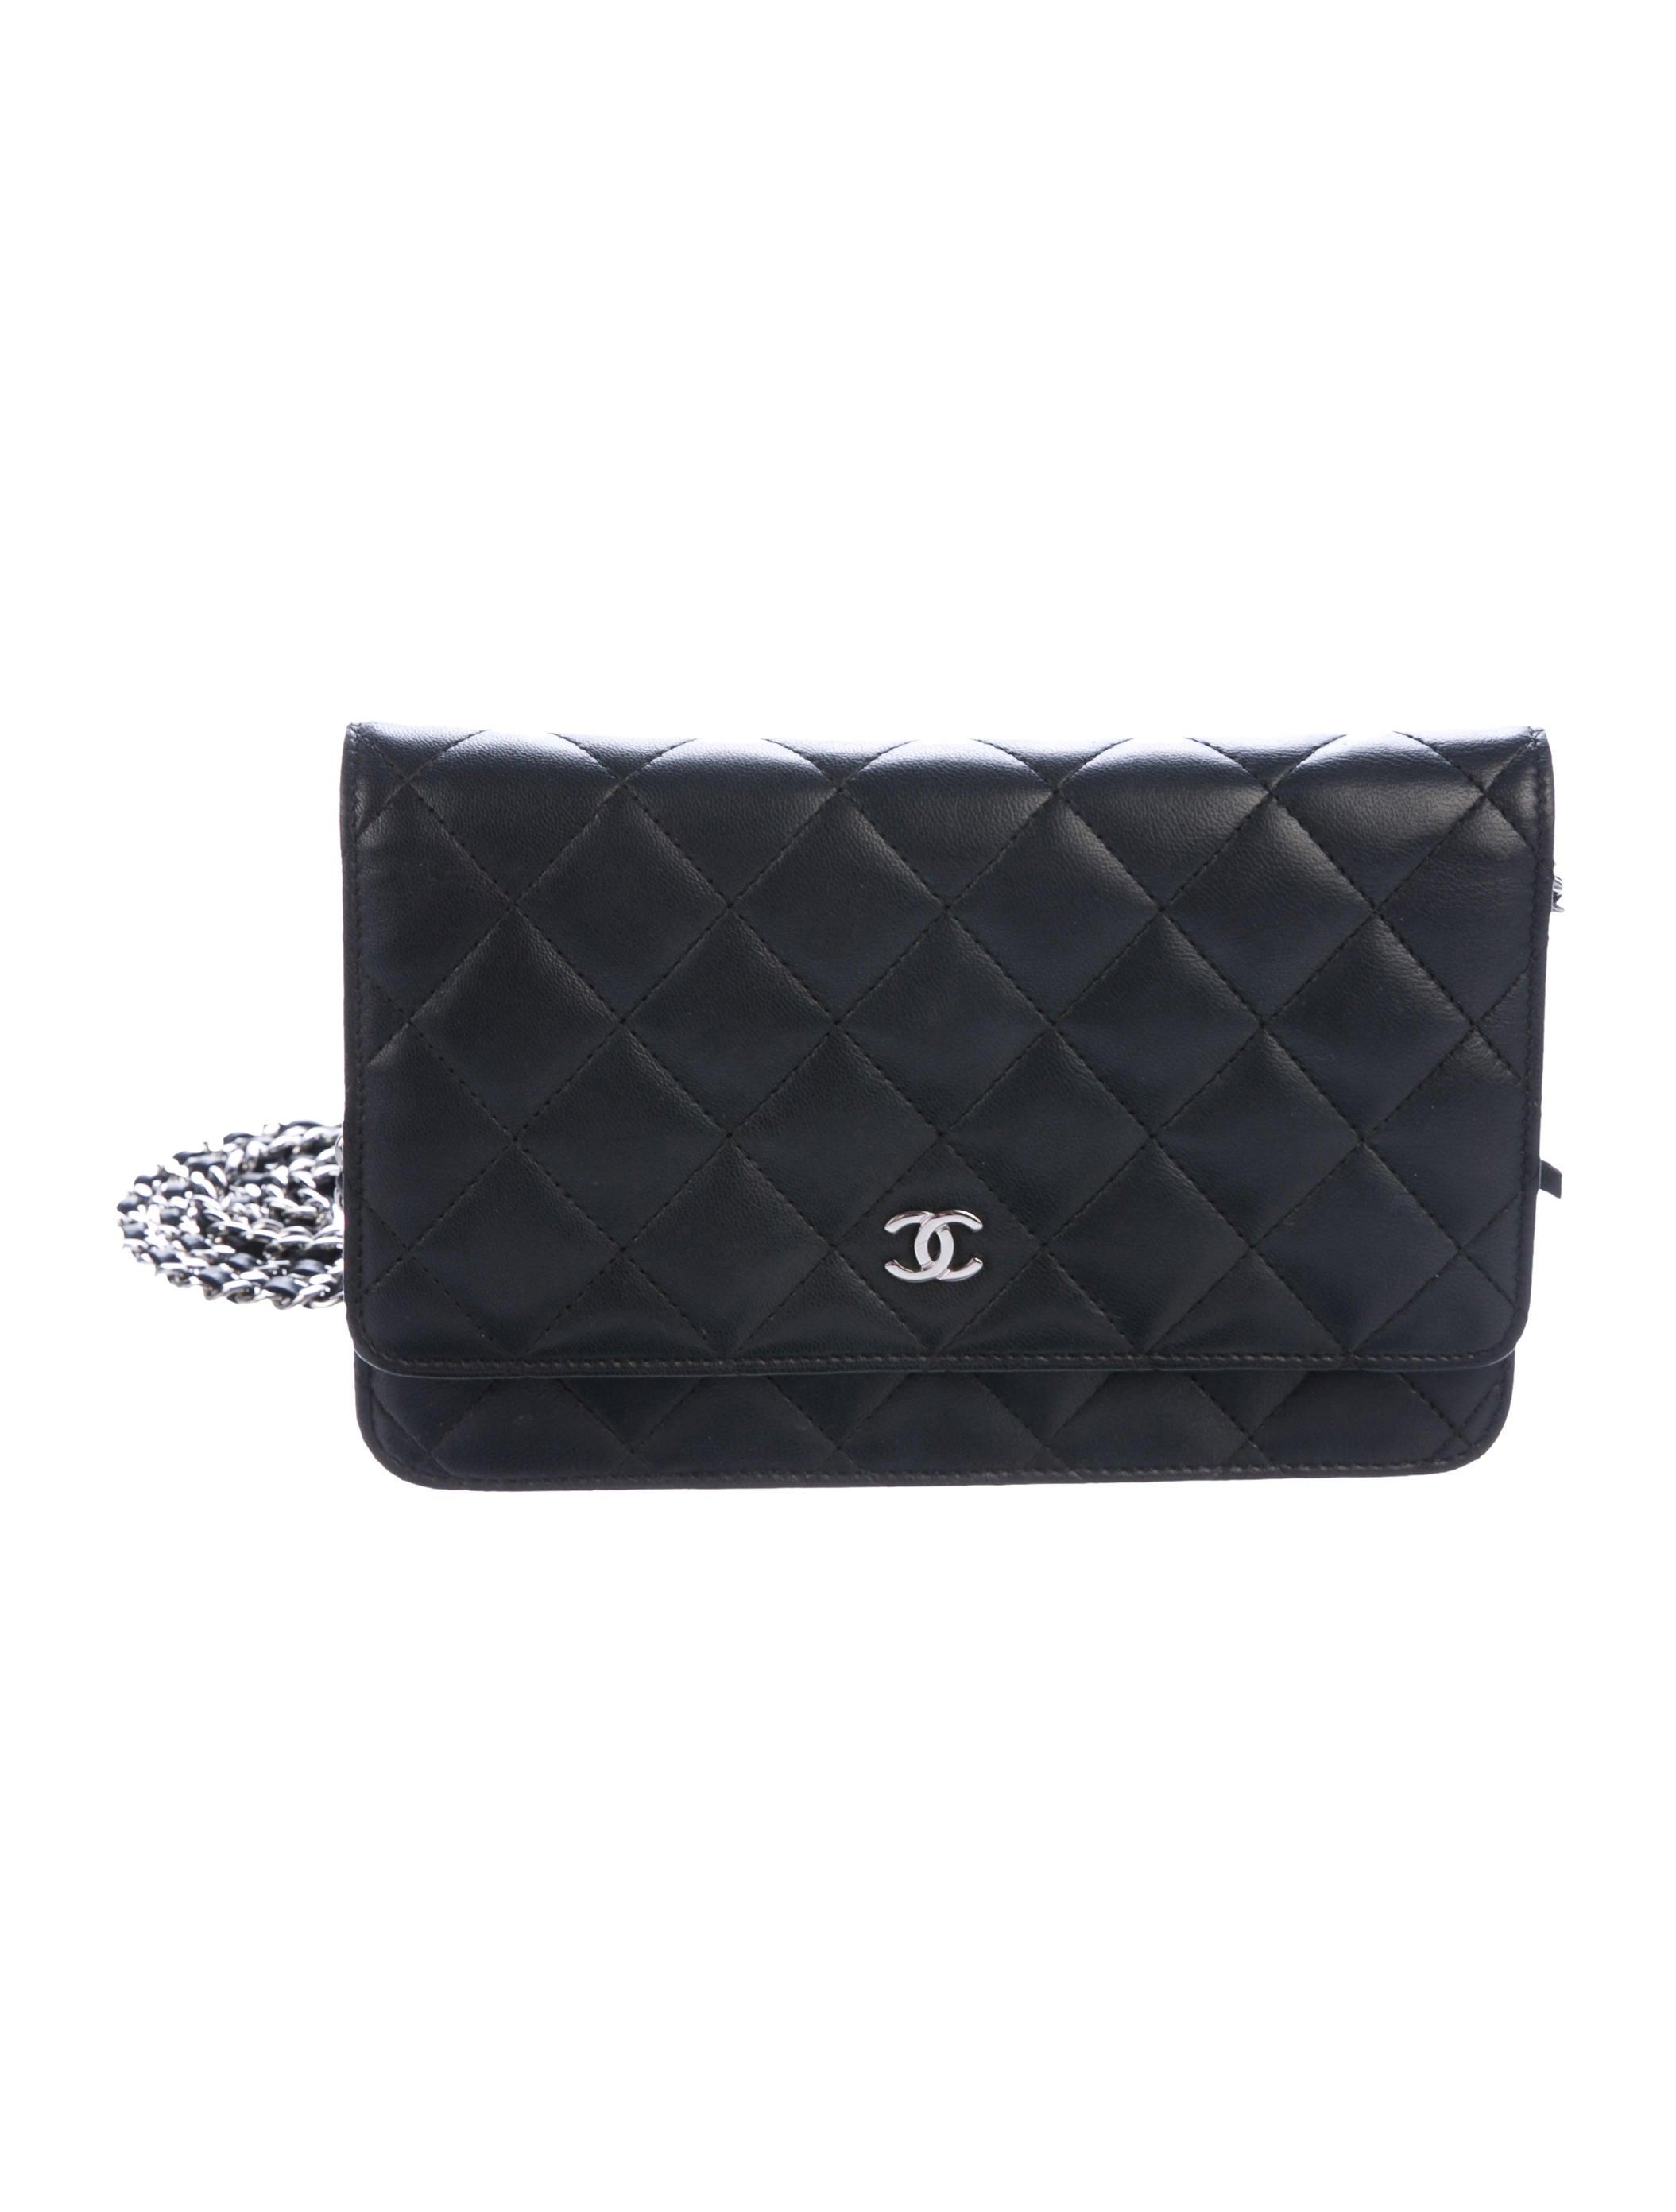 Chanel Handbags  f378e9cc7c